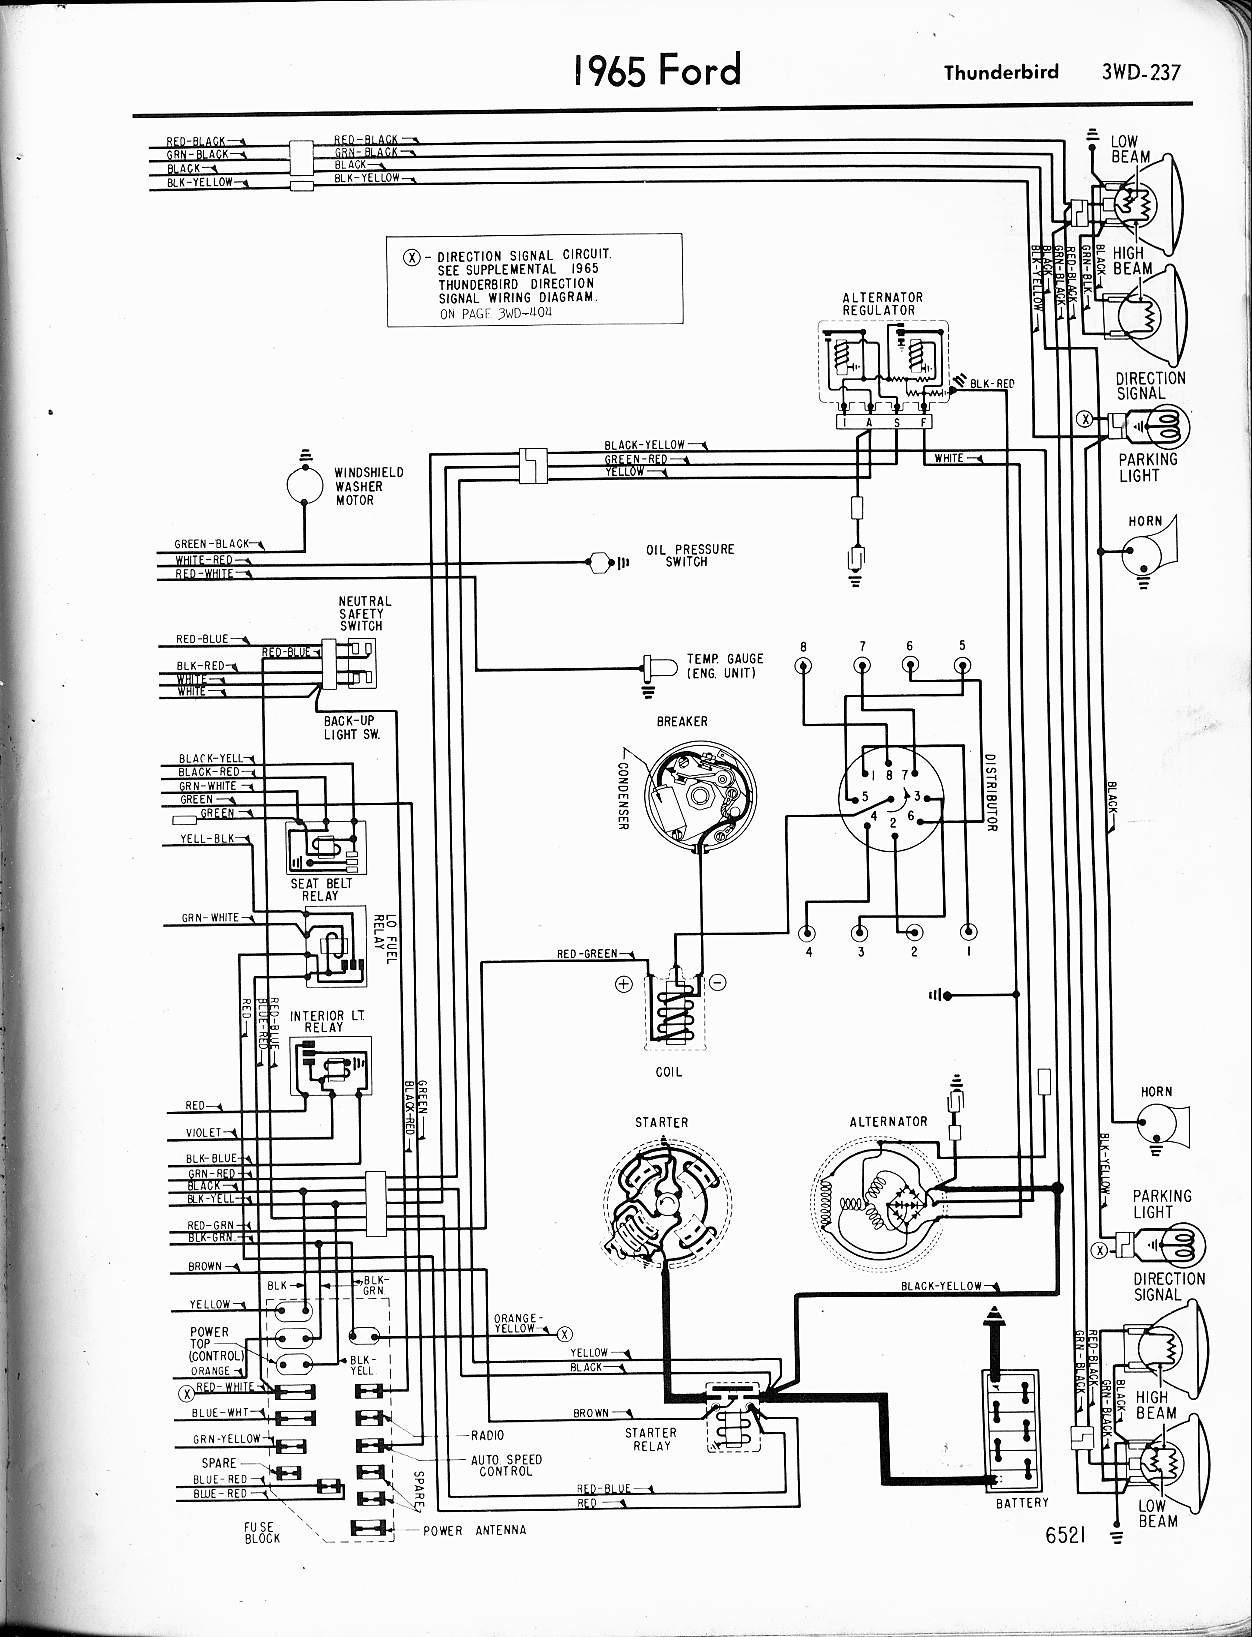 1965 ford thunderbird wiring diagram as well as 1965 ford rh dasdes co